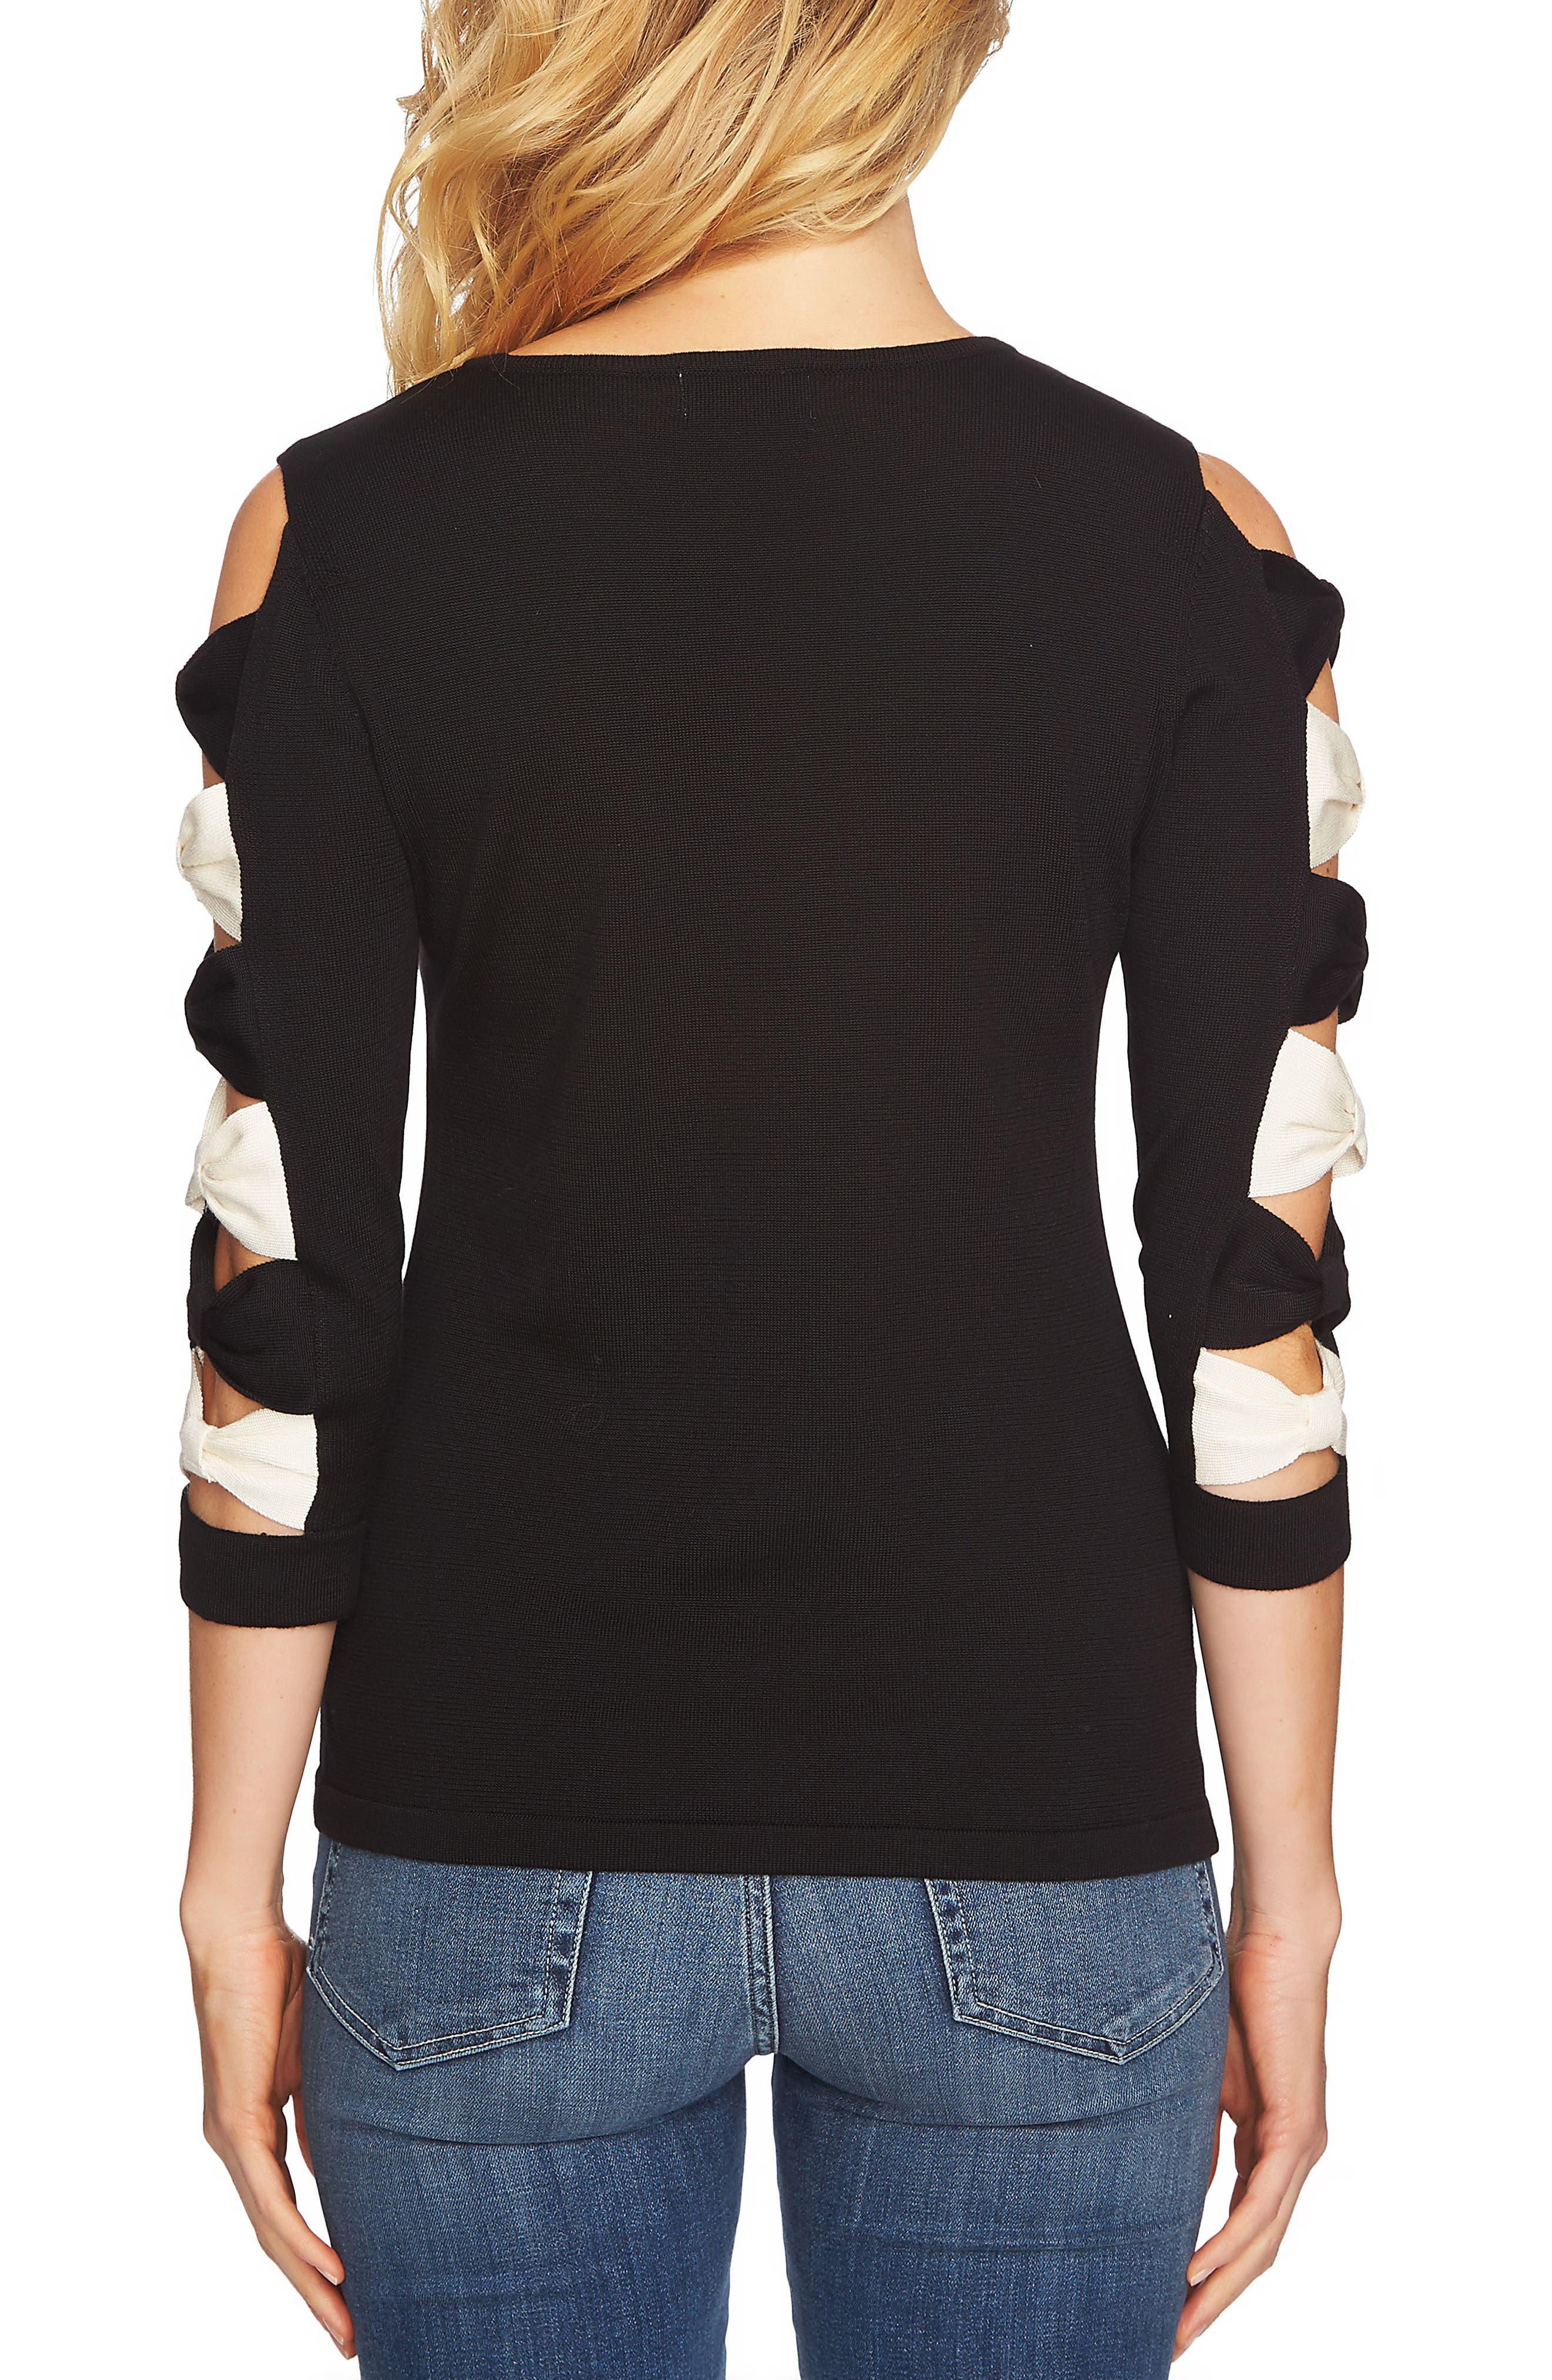 Bow Sleeve Crewneck Sweater,                             Alternate thumbnail 2, color,                             060-Rich Black